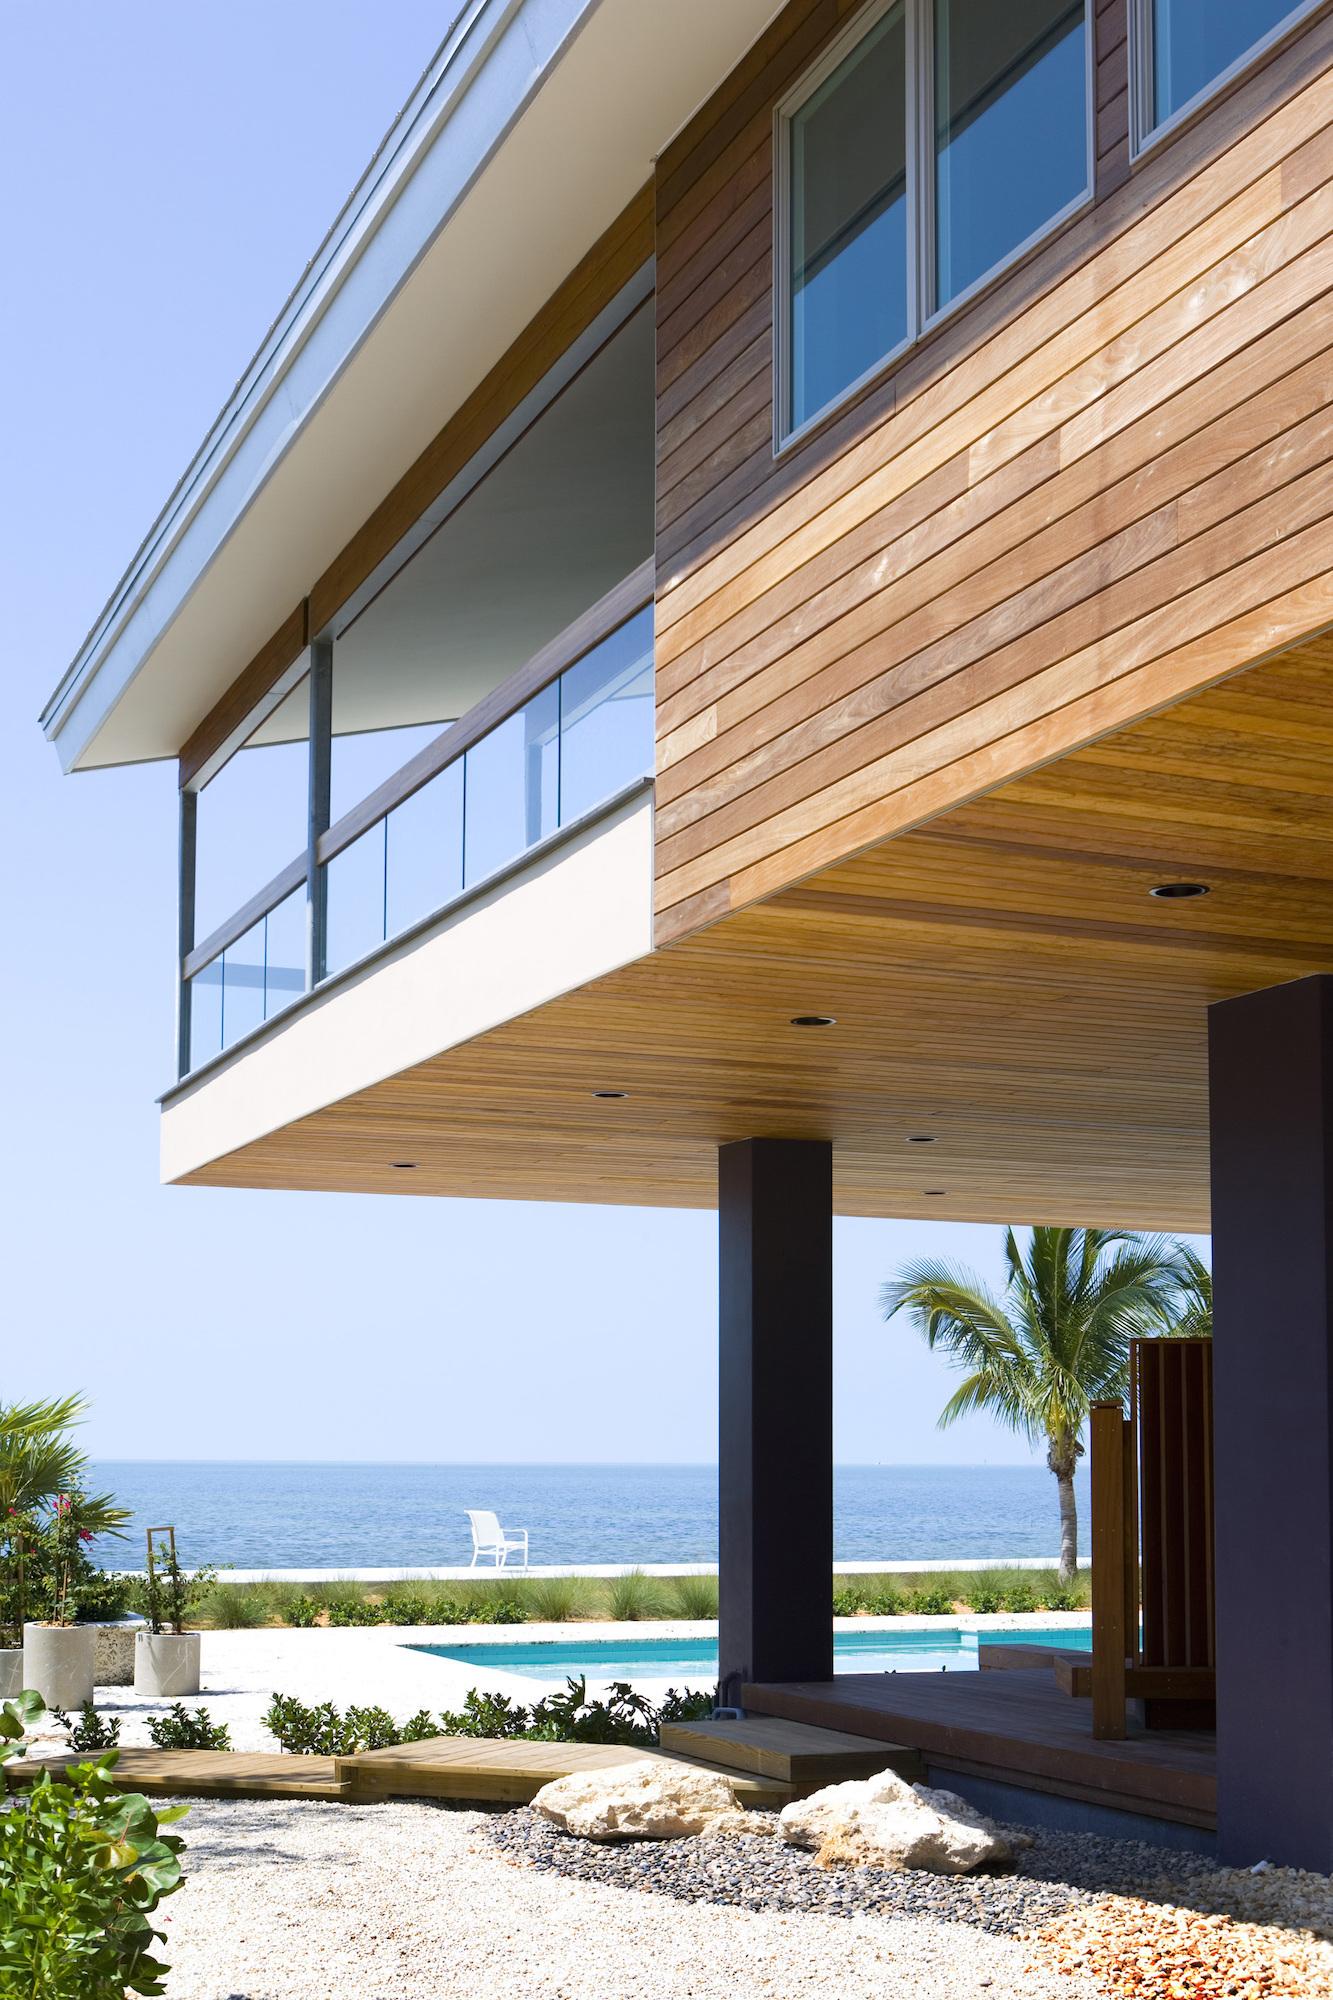 residencia-tavernier-drive-luis-pons-design-lab_eric_carle_060407_045